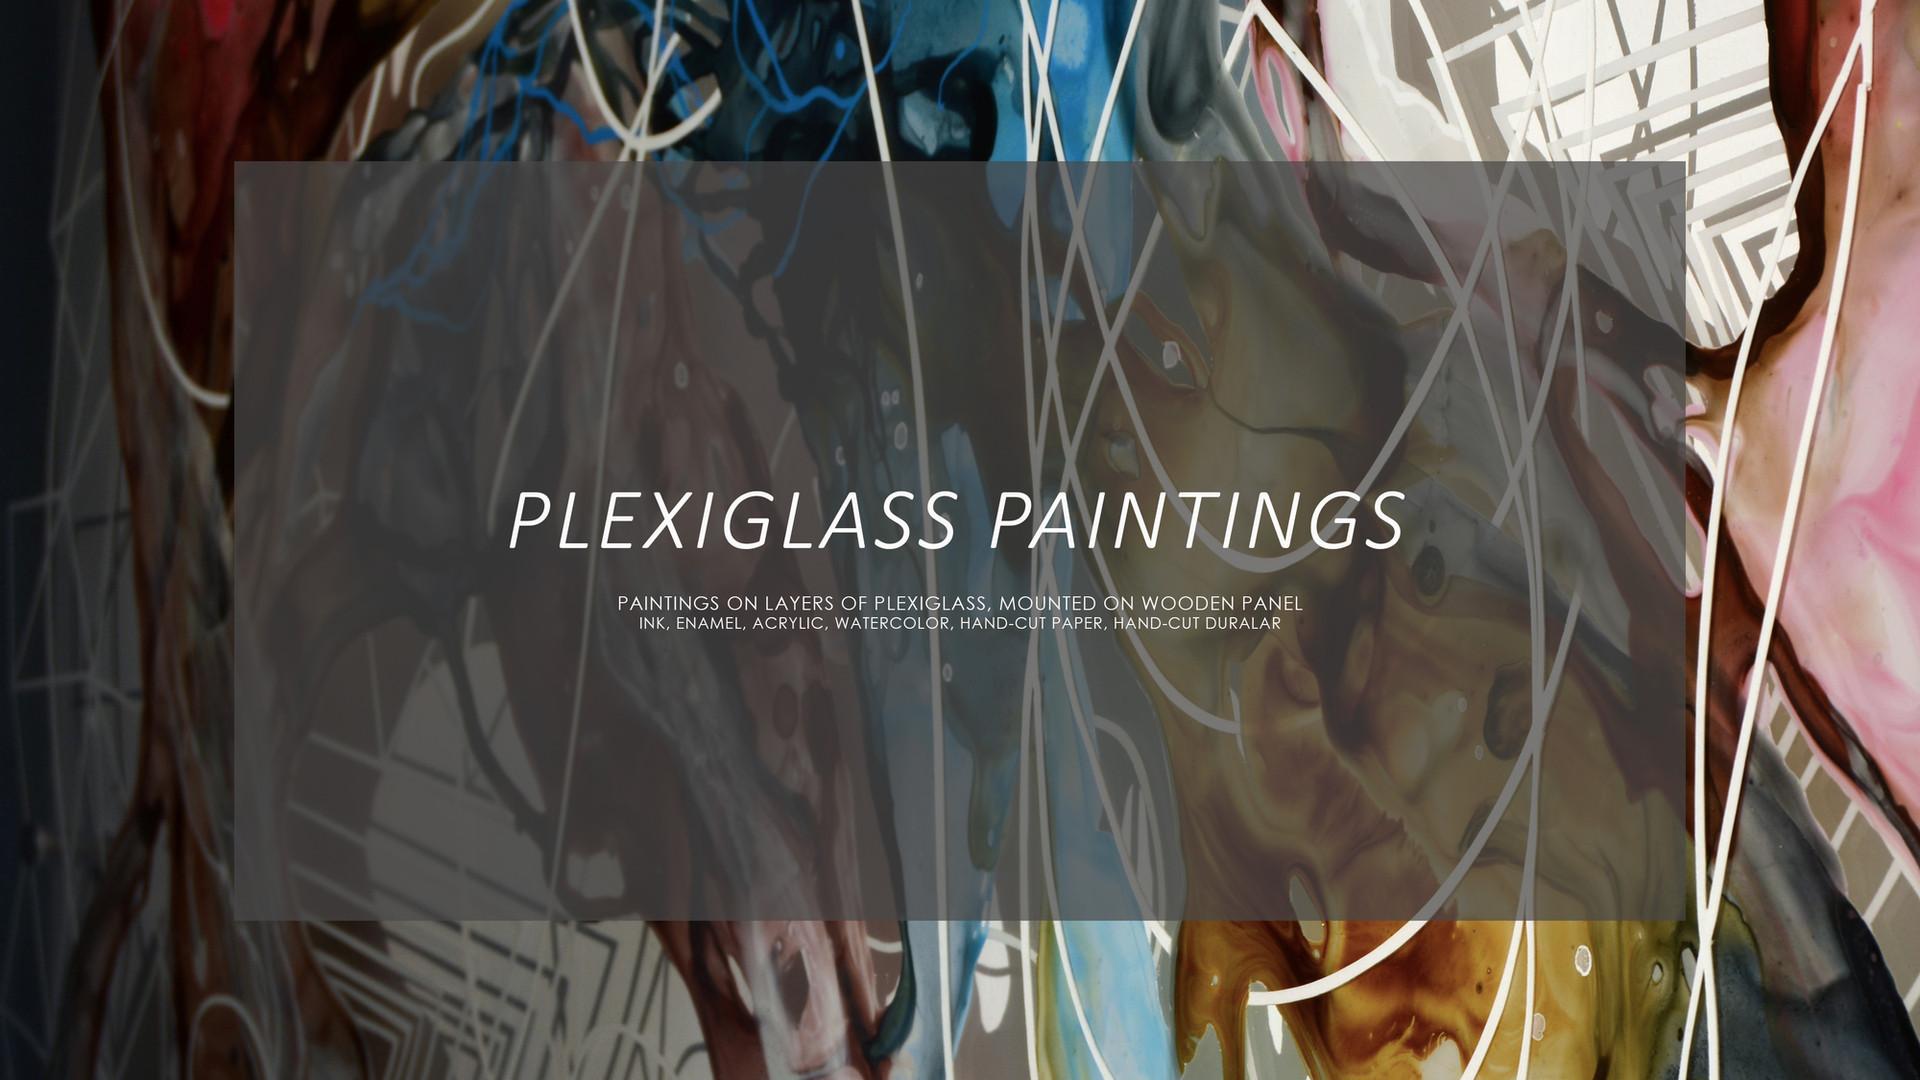 PLEXIGLASS PAINTINGS PAGE.jpg